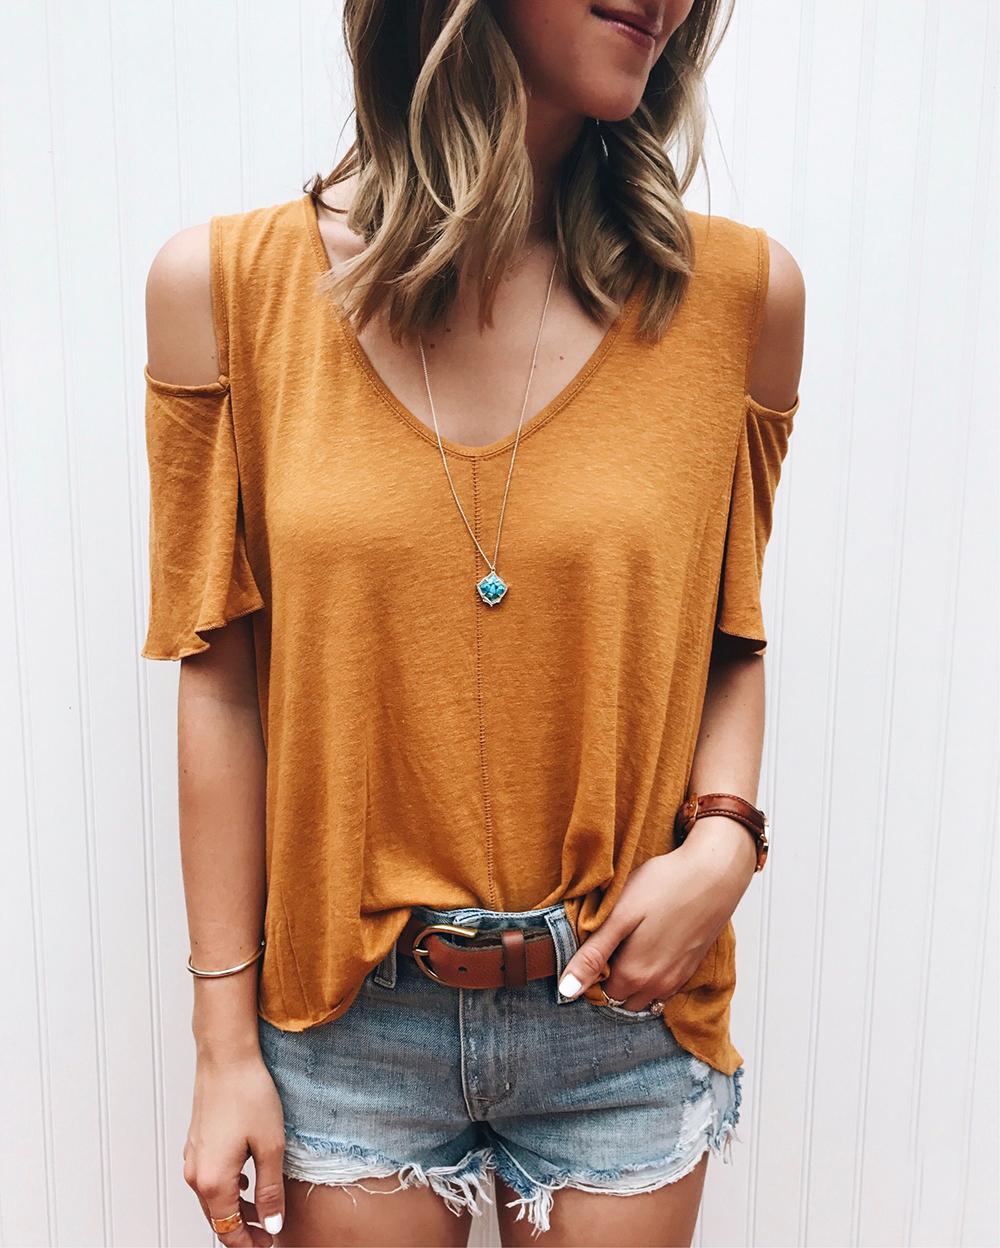 livvyland-blog-olivia-watson-instagram-roundup-june-summer-style-free-people-mustard-top-grlfrnd-shorts